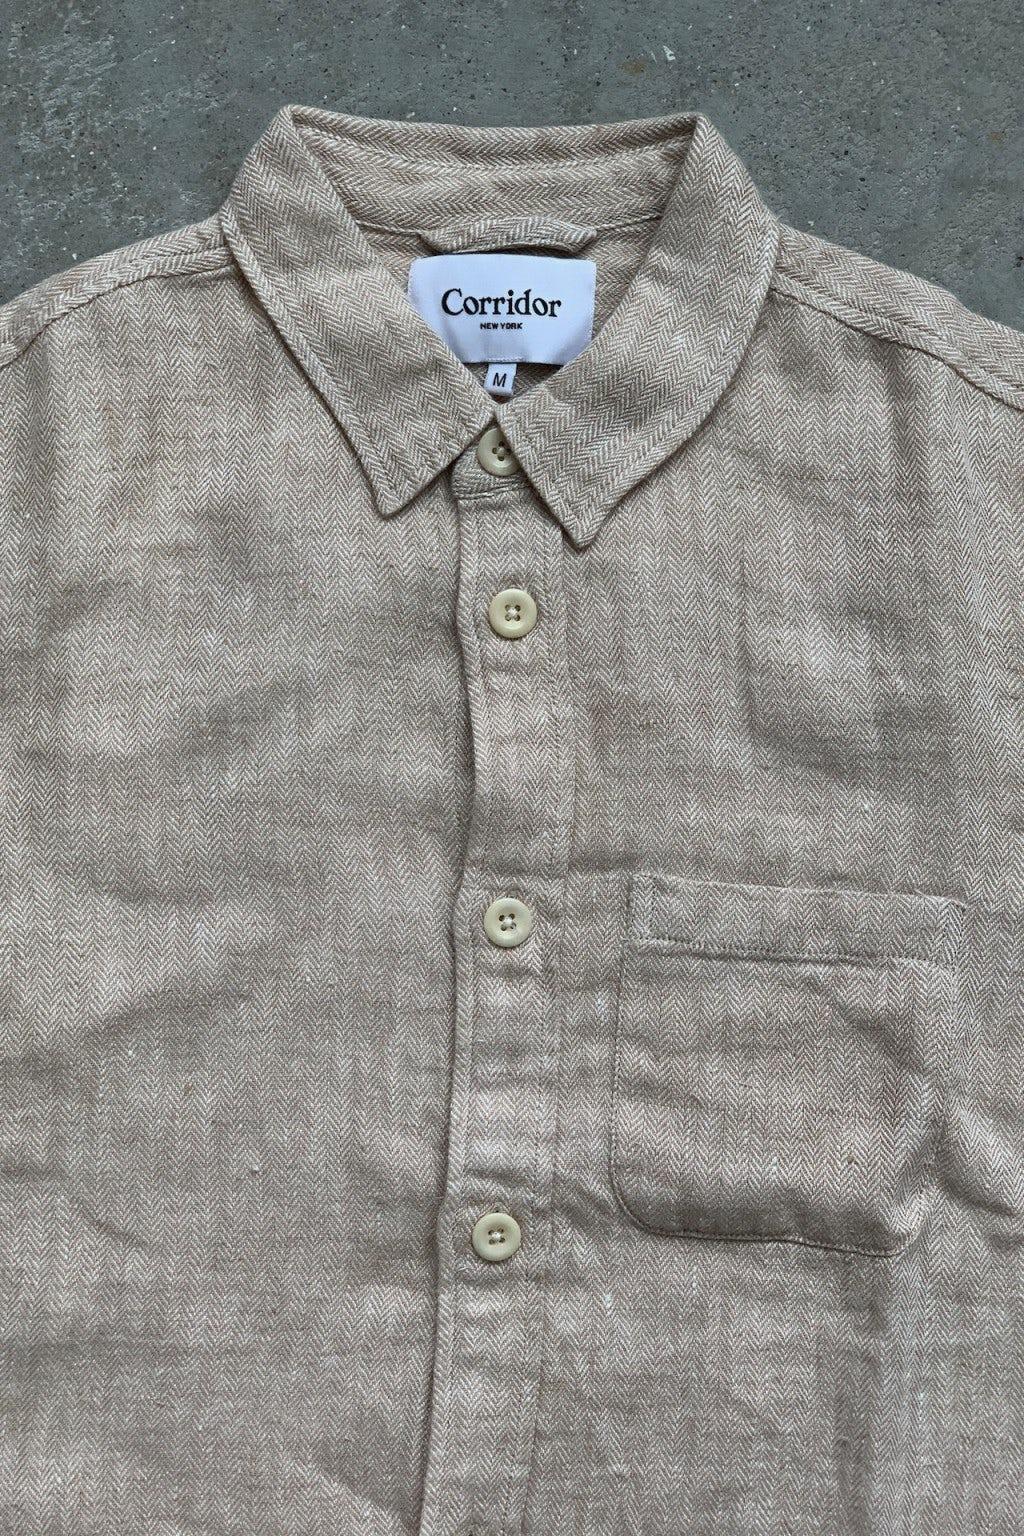 Corridor Natural Linen Herringbone Overshirt  Natural